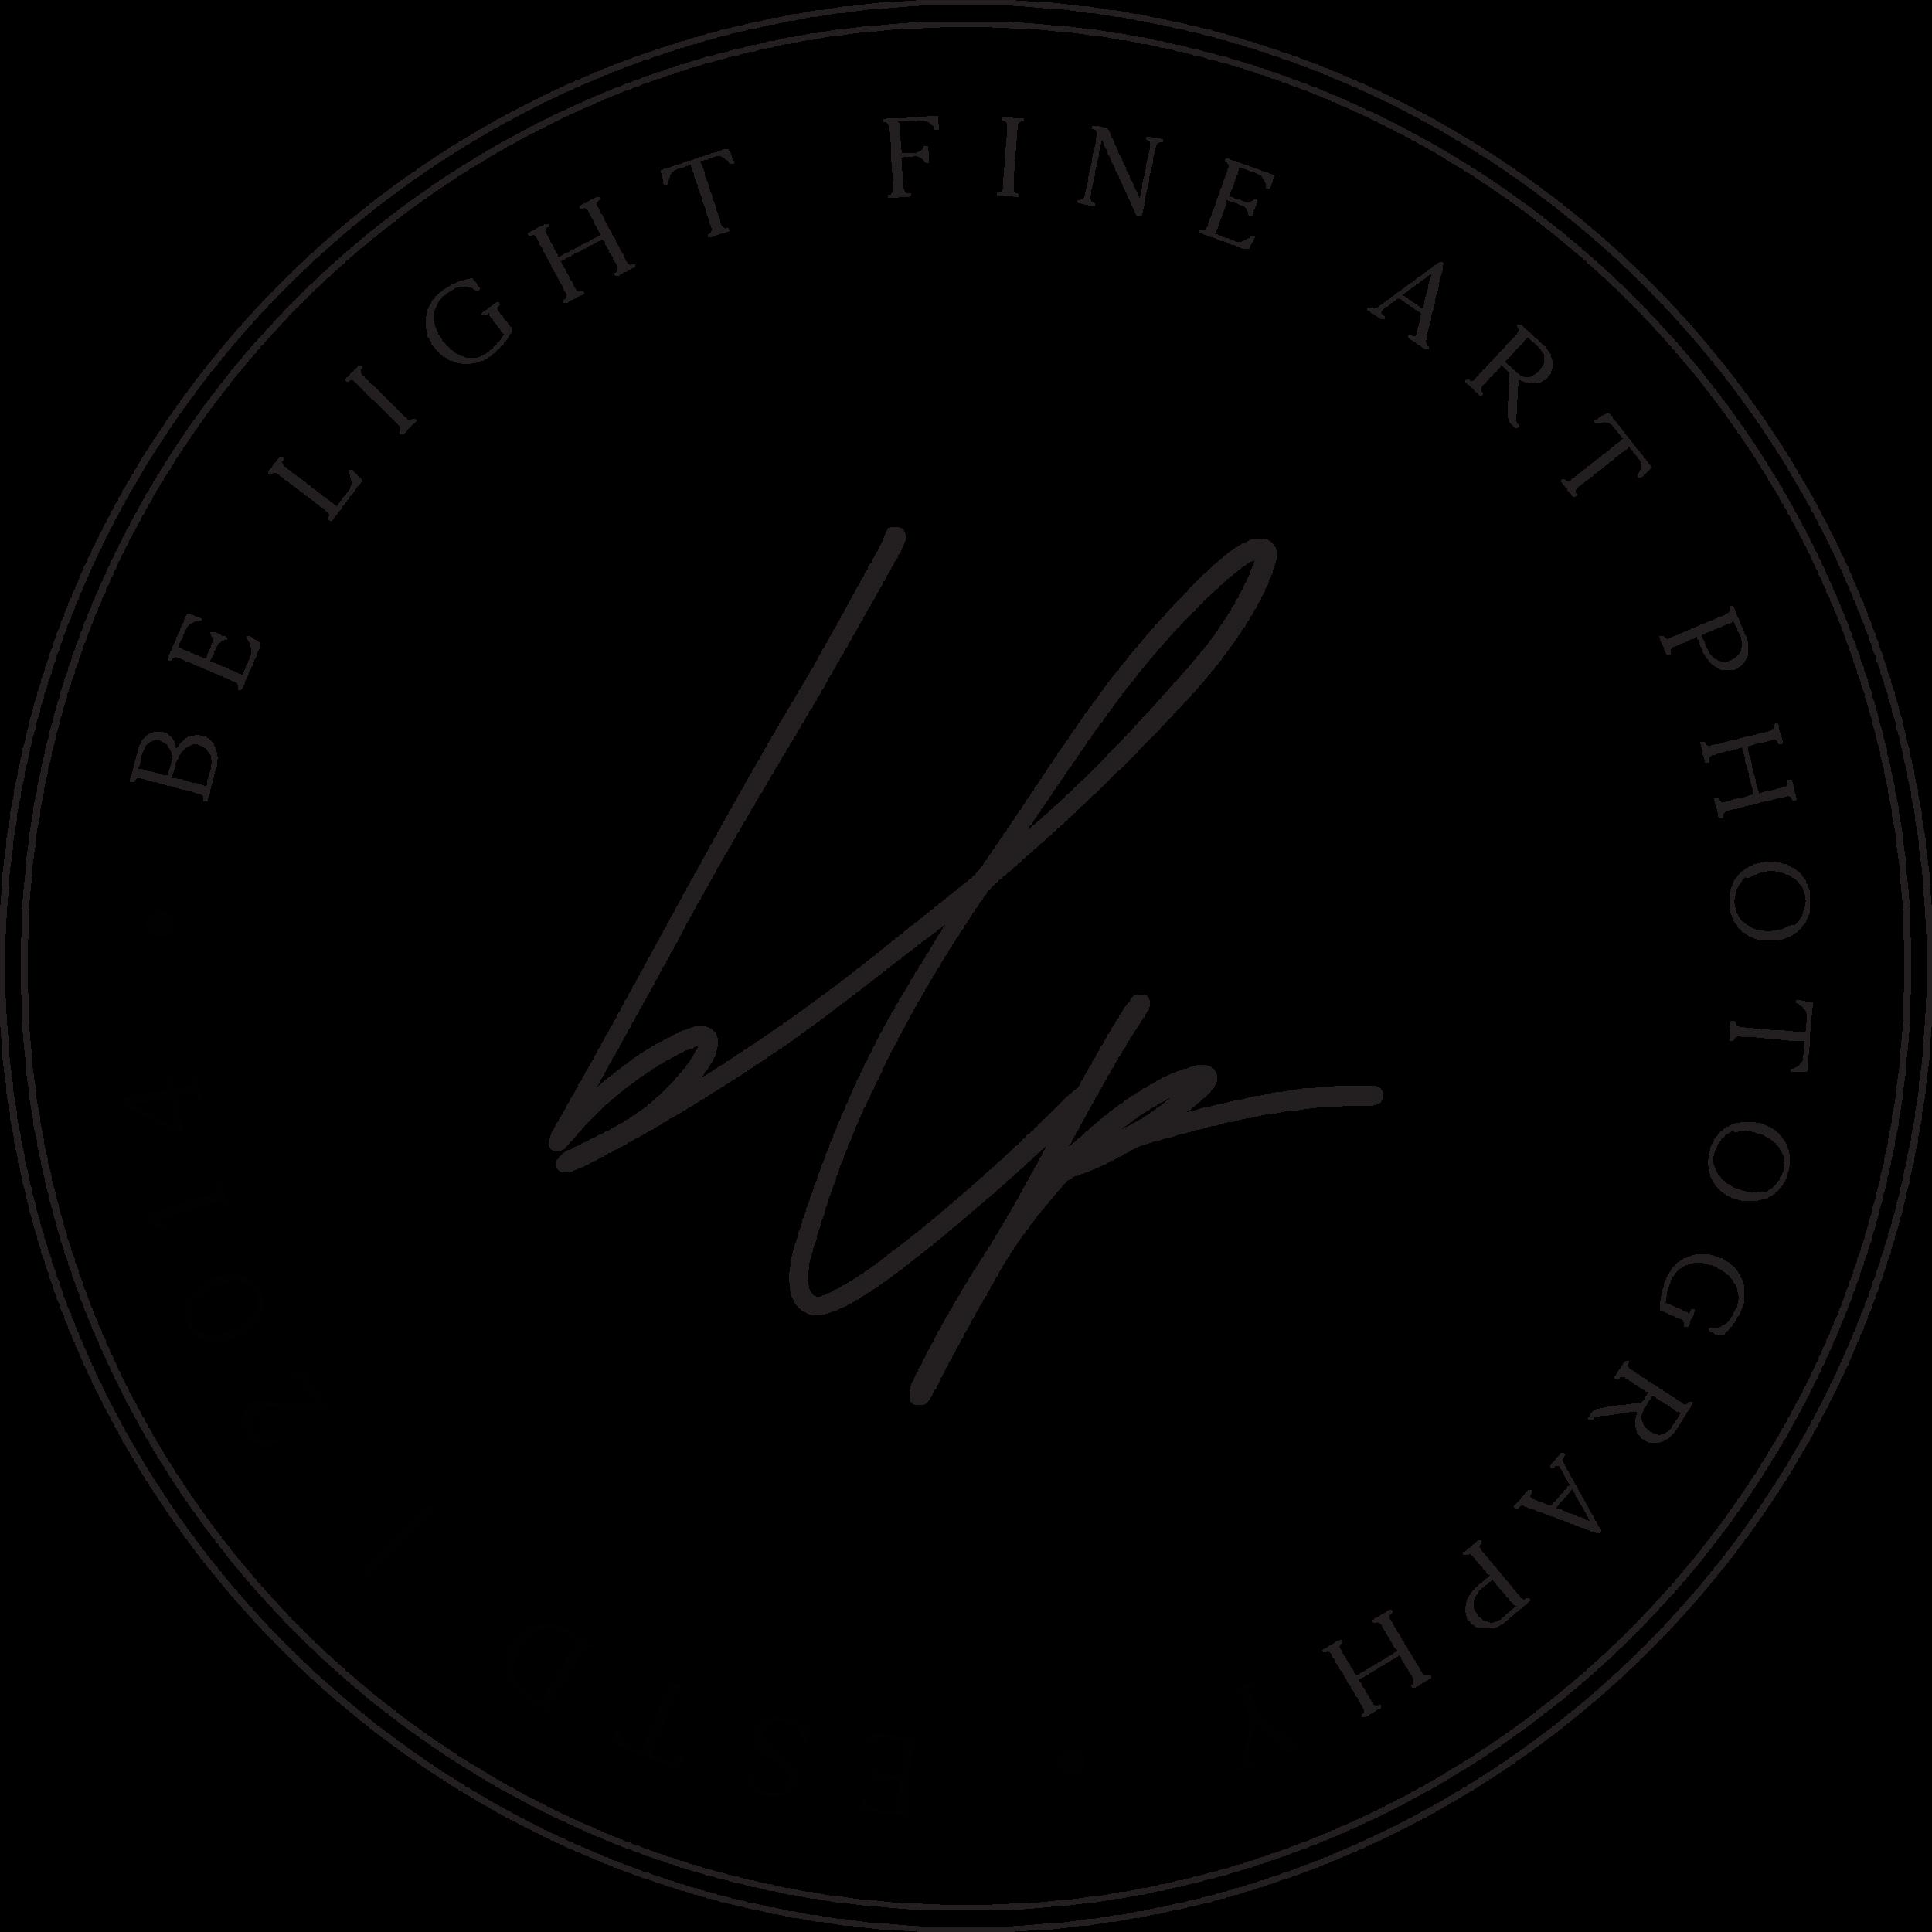 be-light-fine-art-photography-secondary-logo-FIN.png